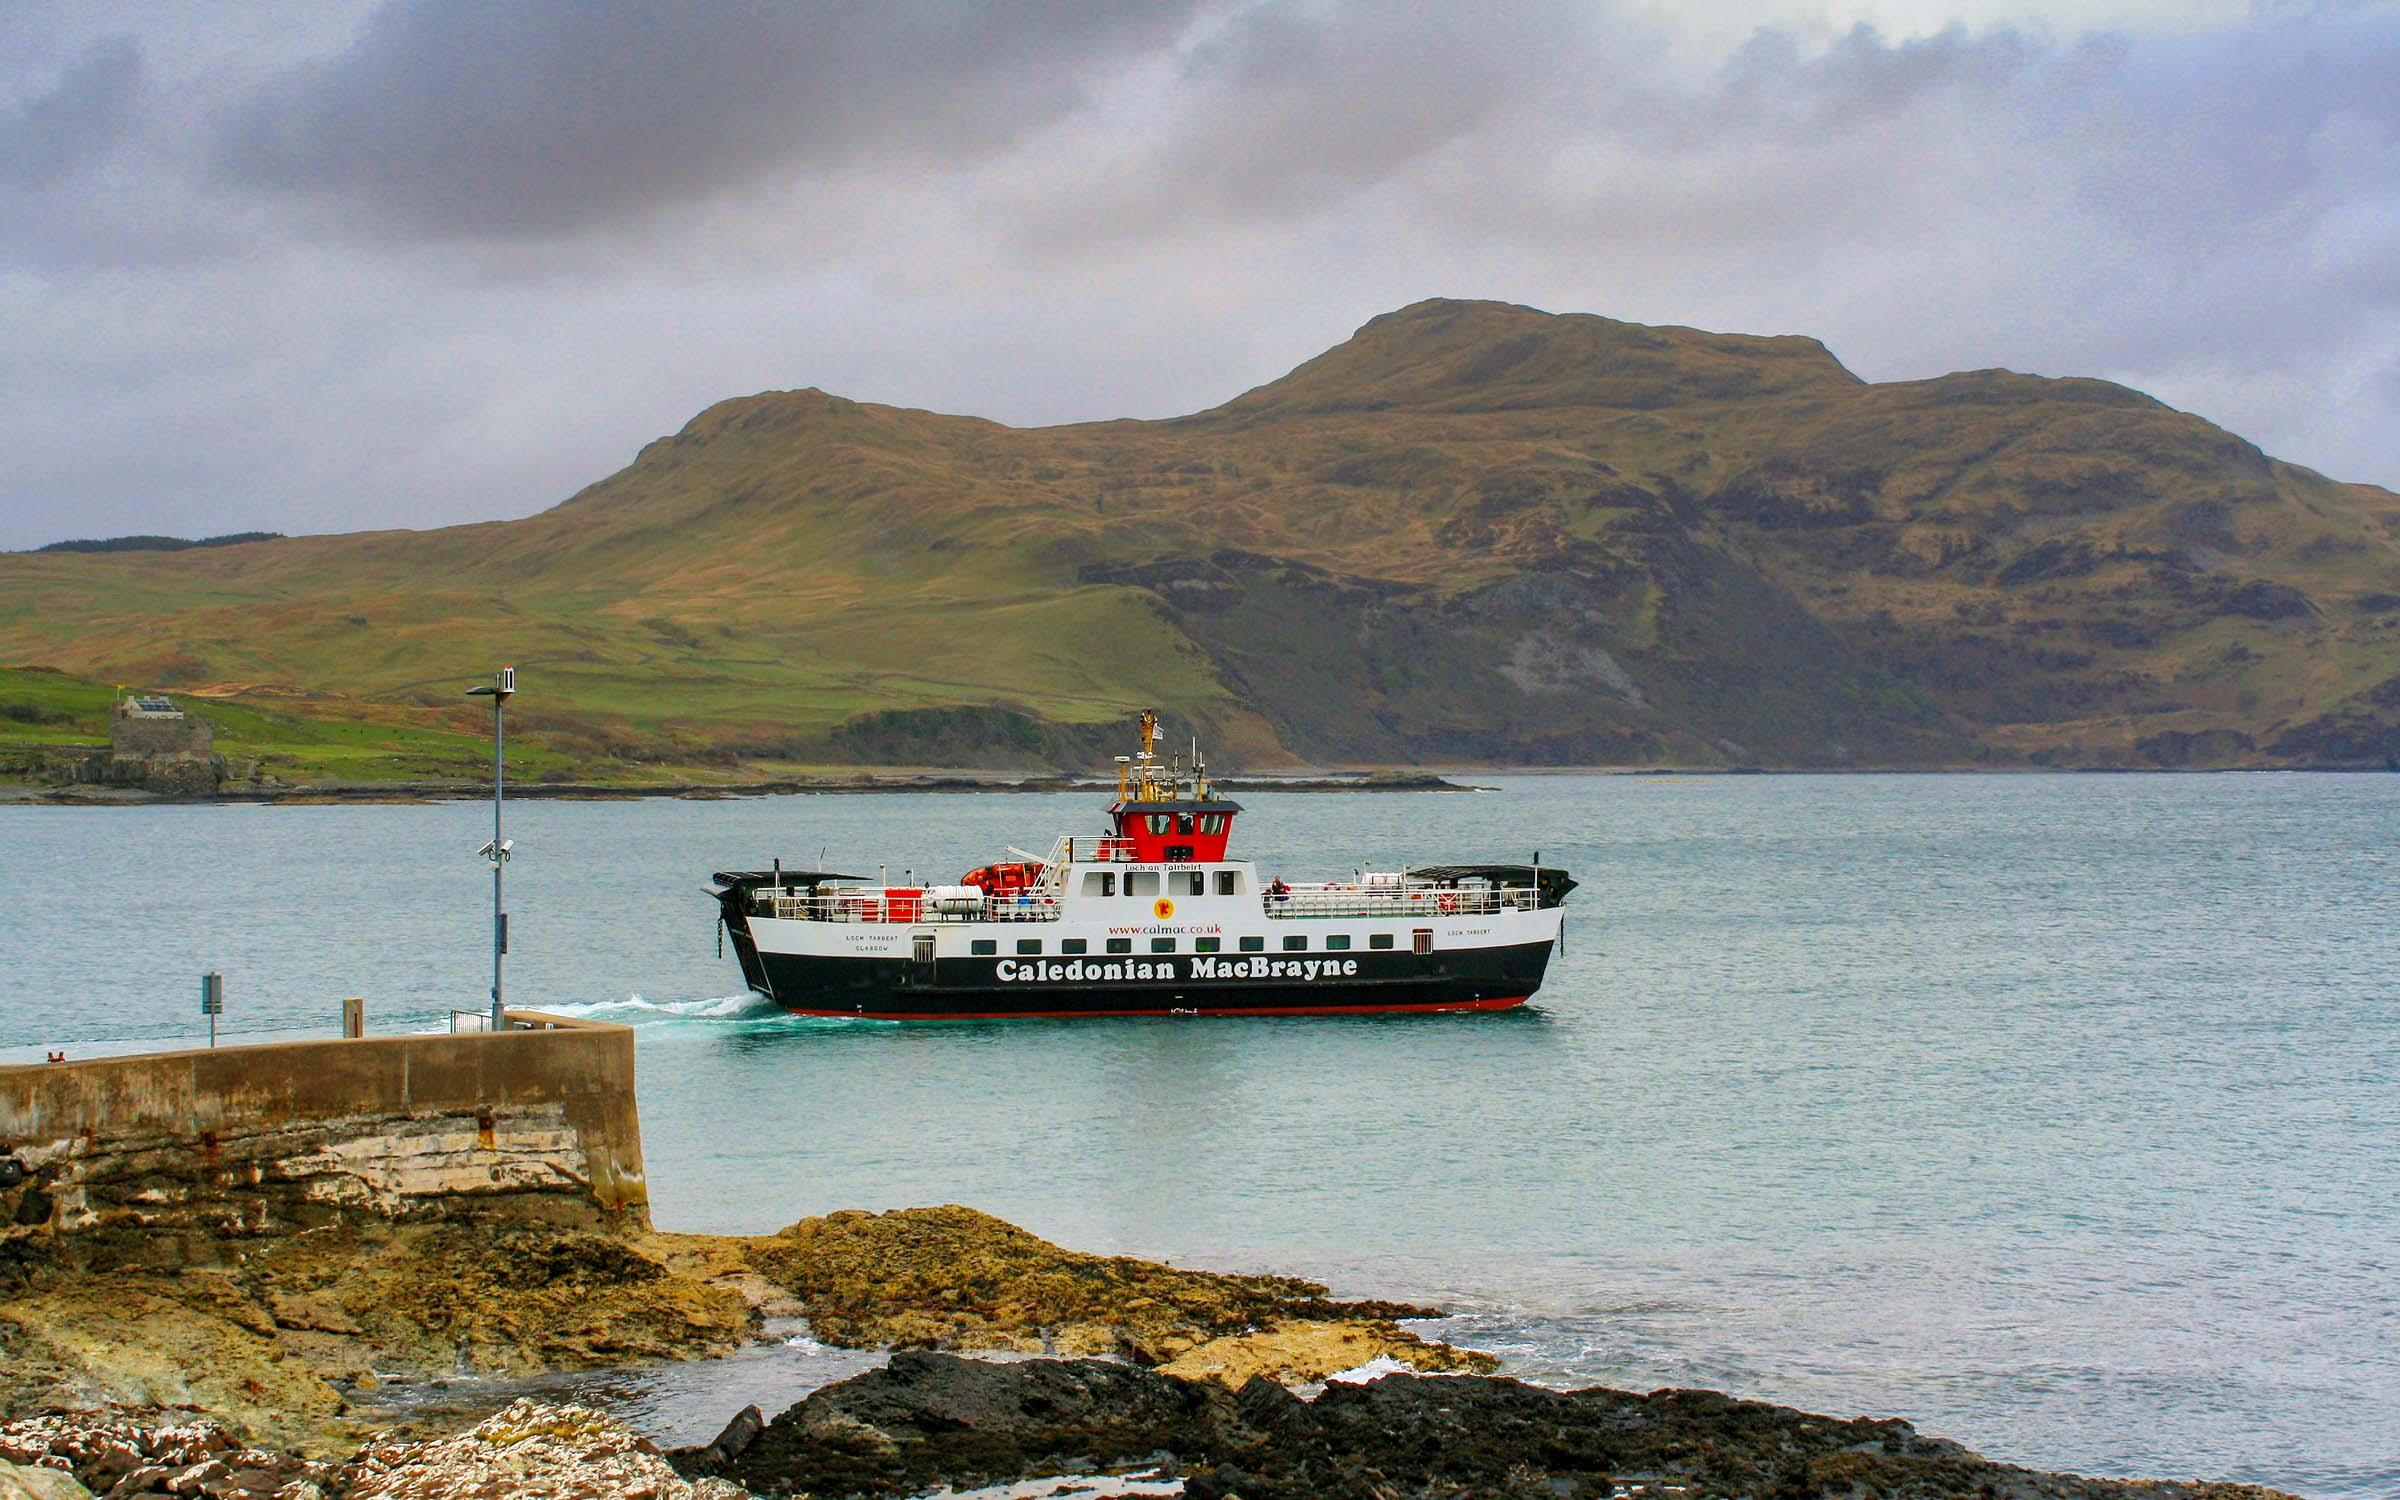 Loch Tarbert leaving Kilchoan (Ships of CalMac)